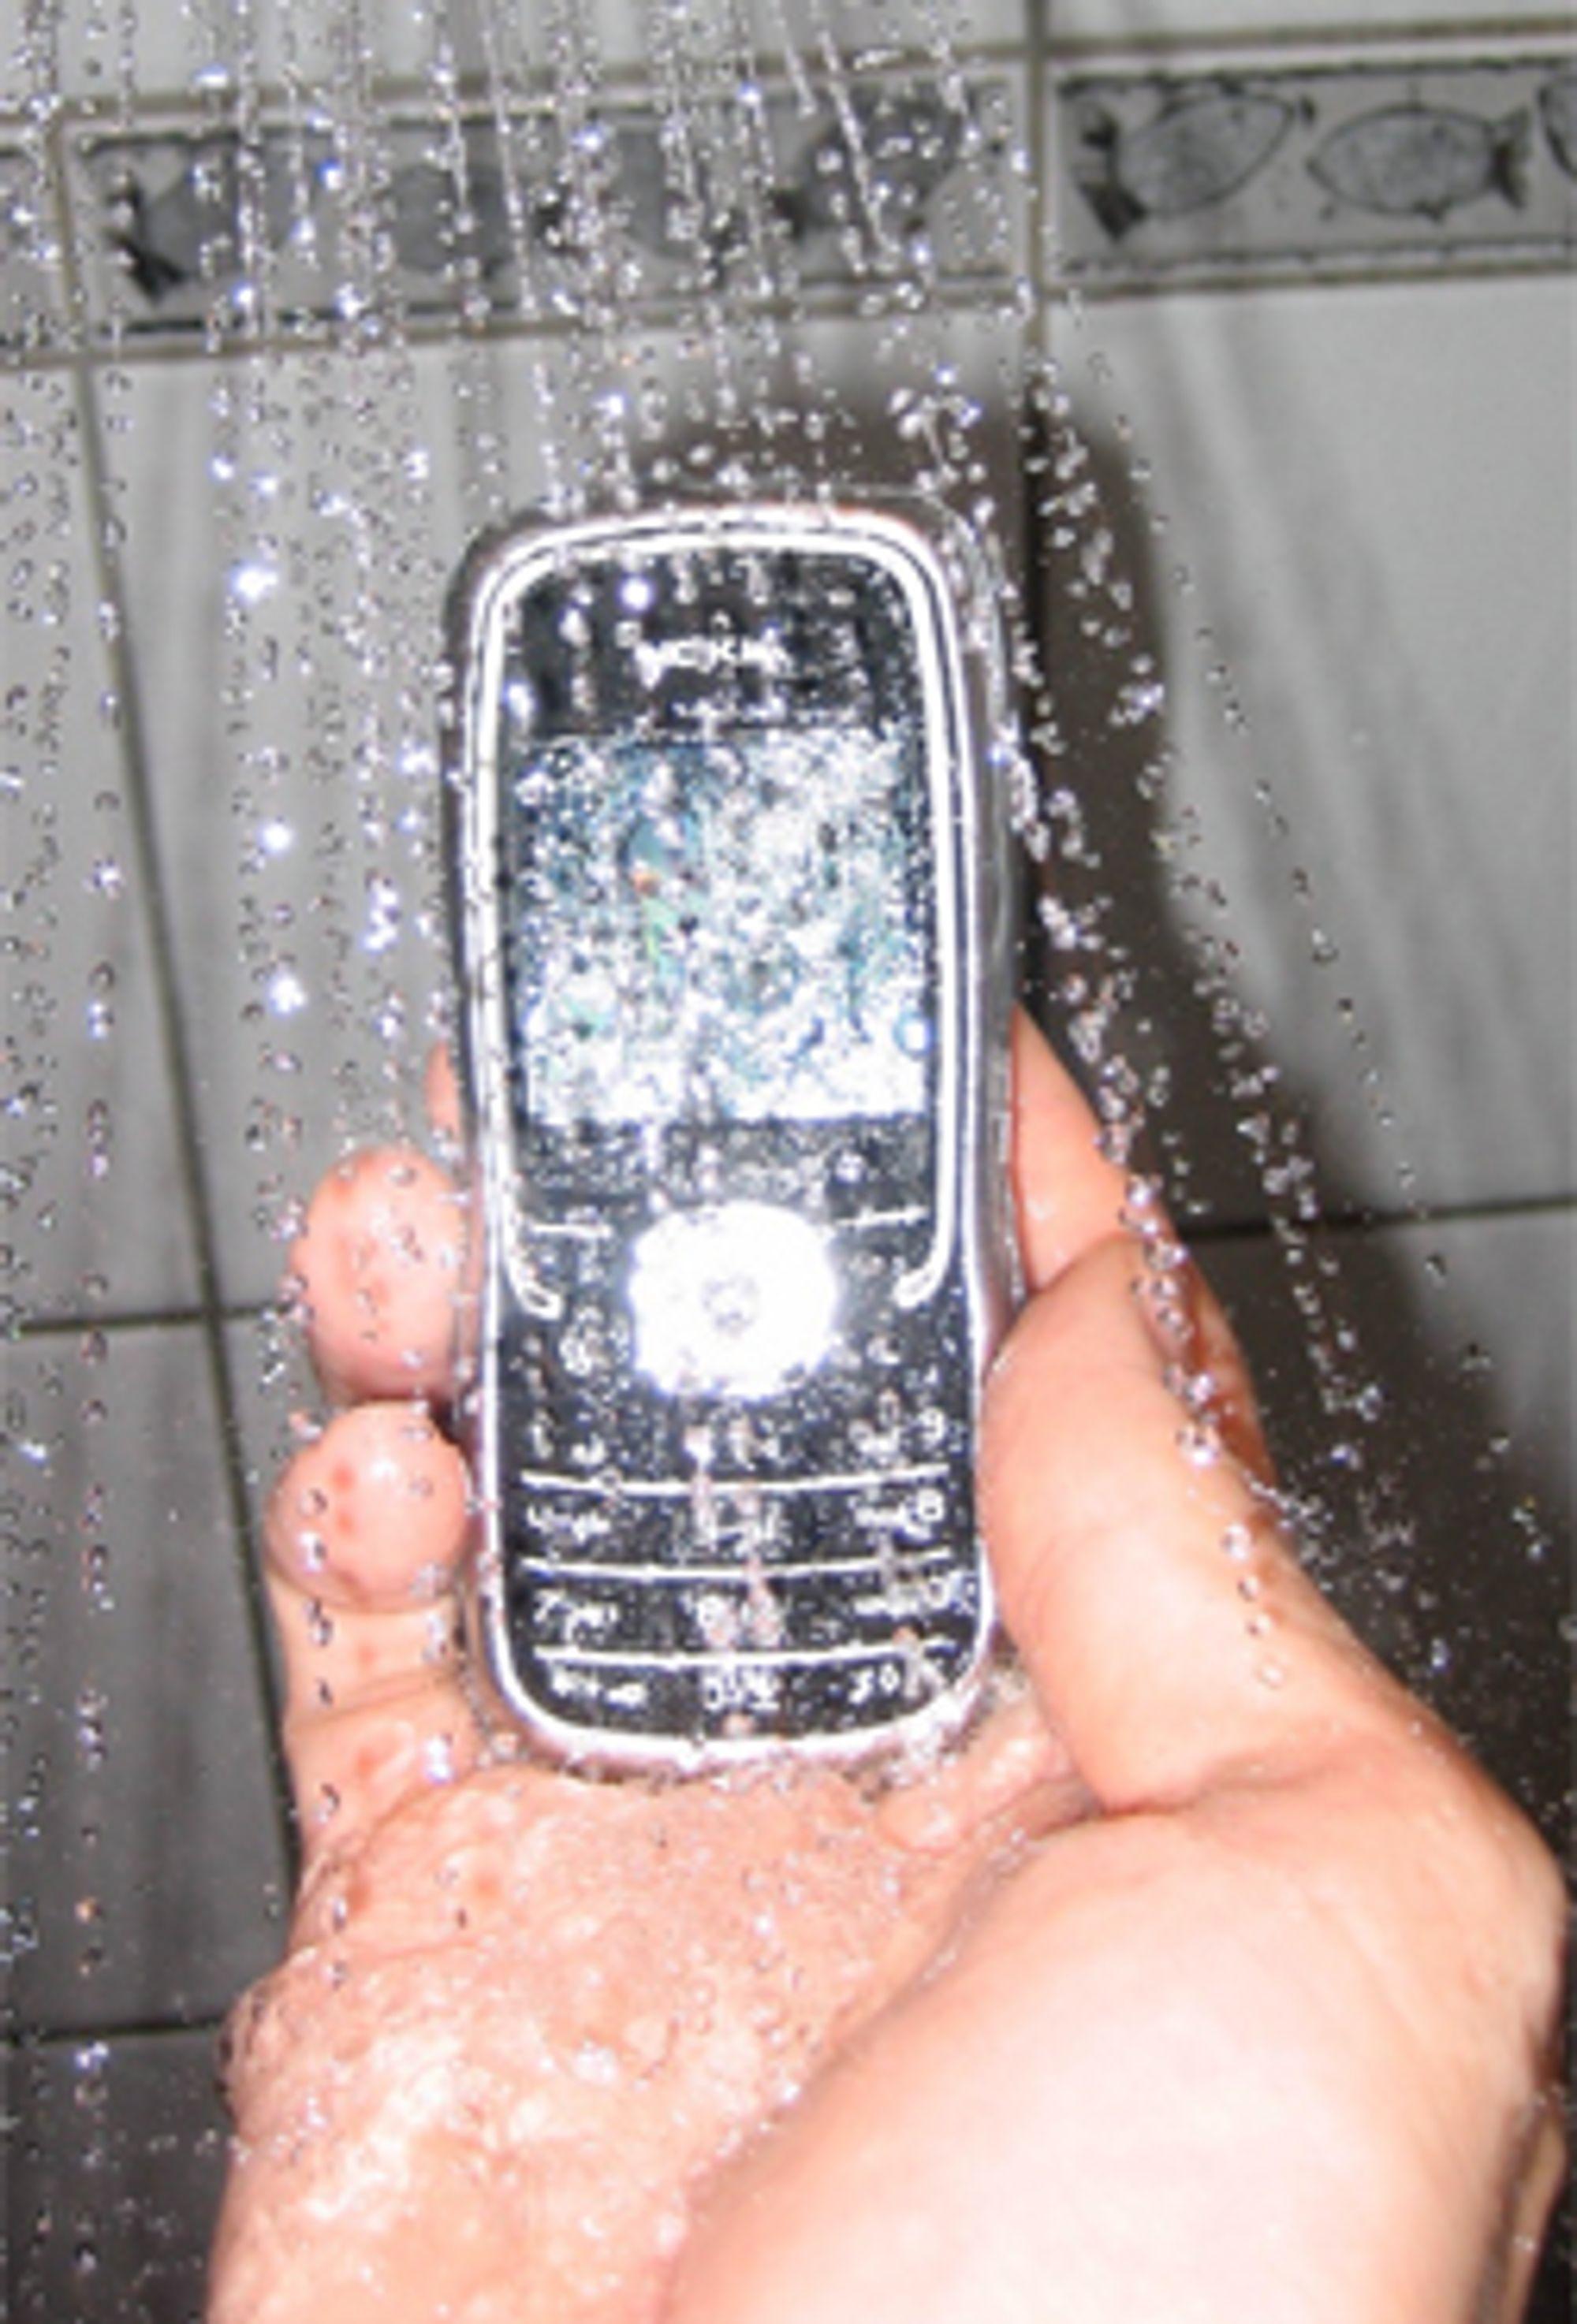 Nokia 5500 tåler en vannsprut. (Foto: Magnus Antonsen)